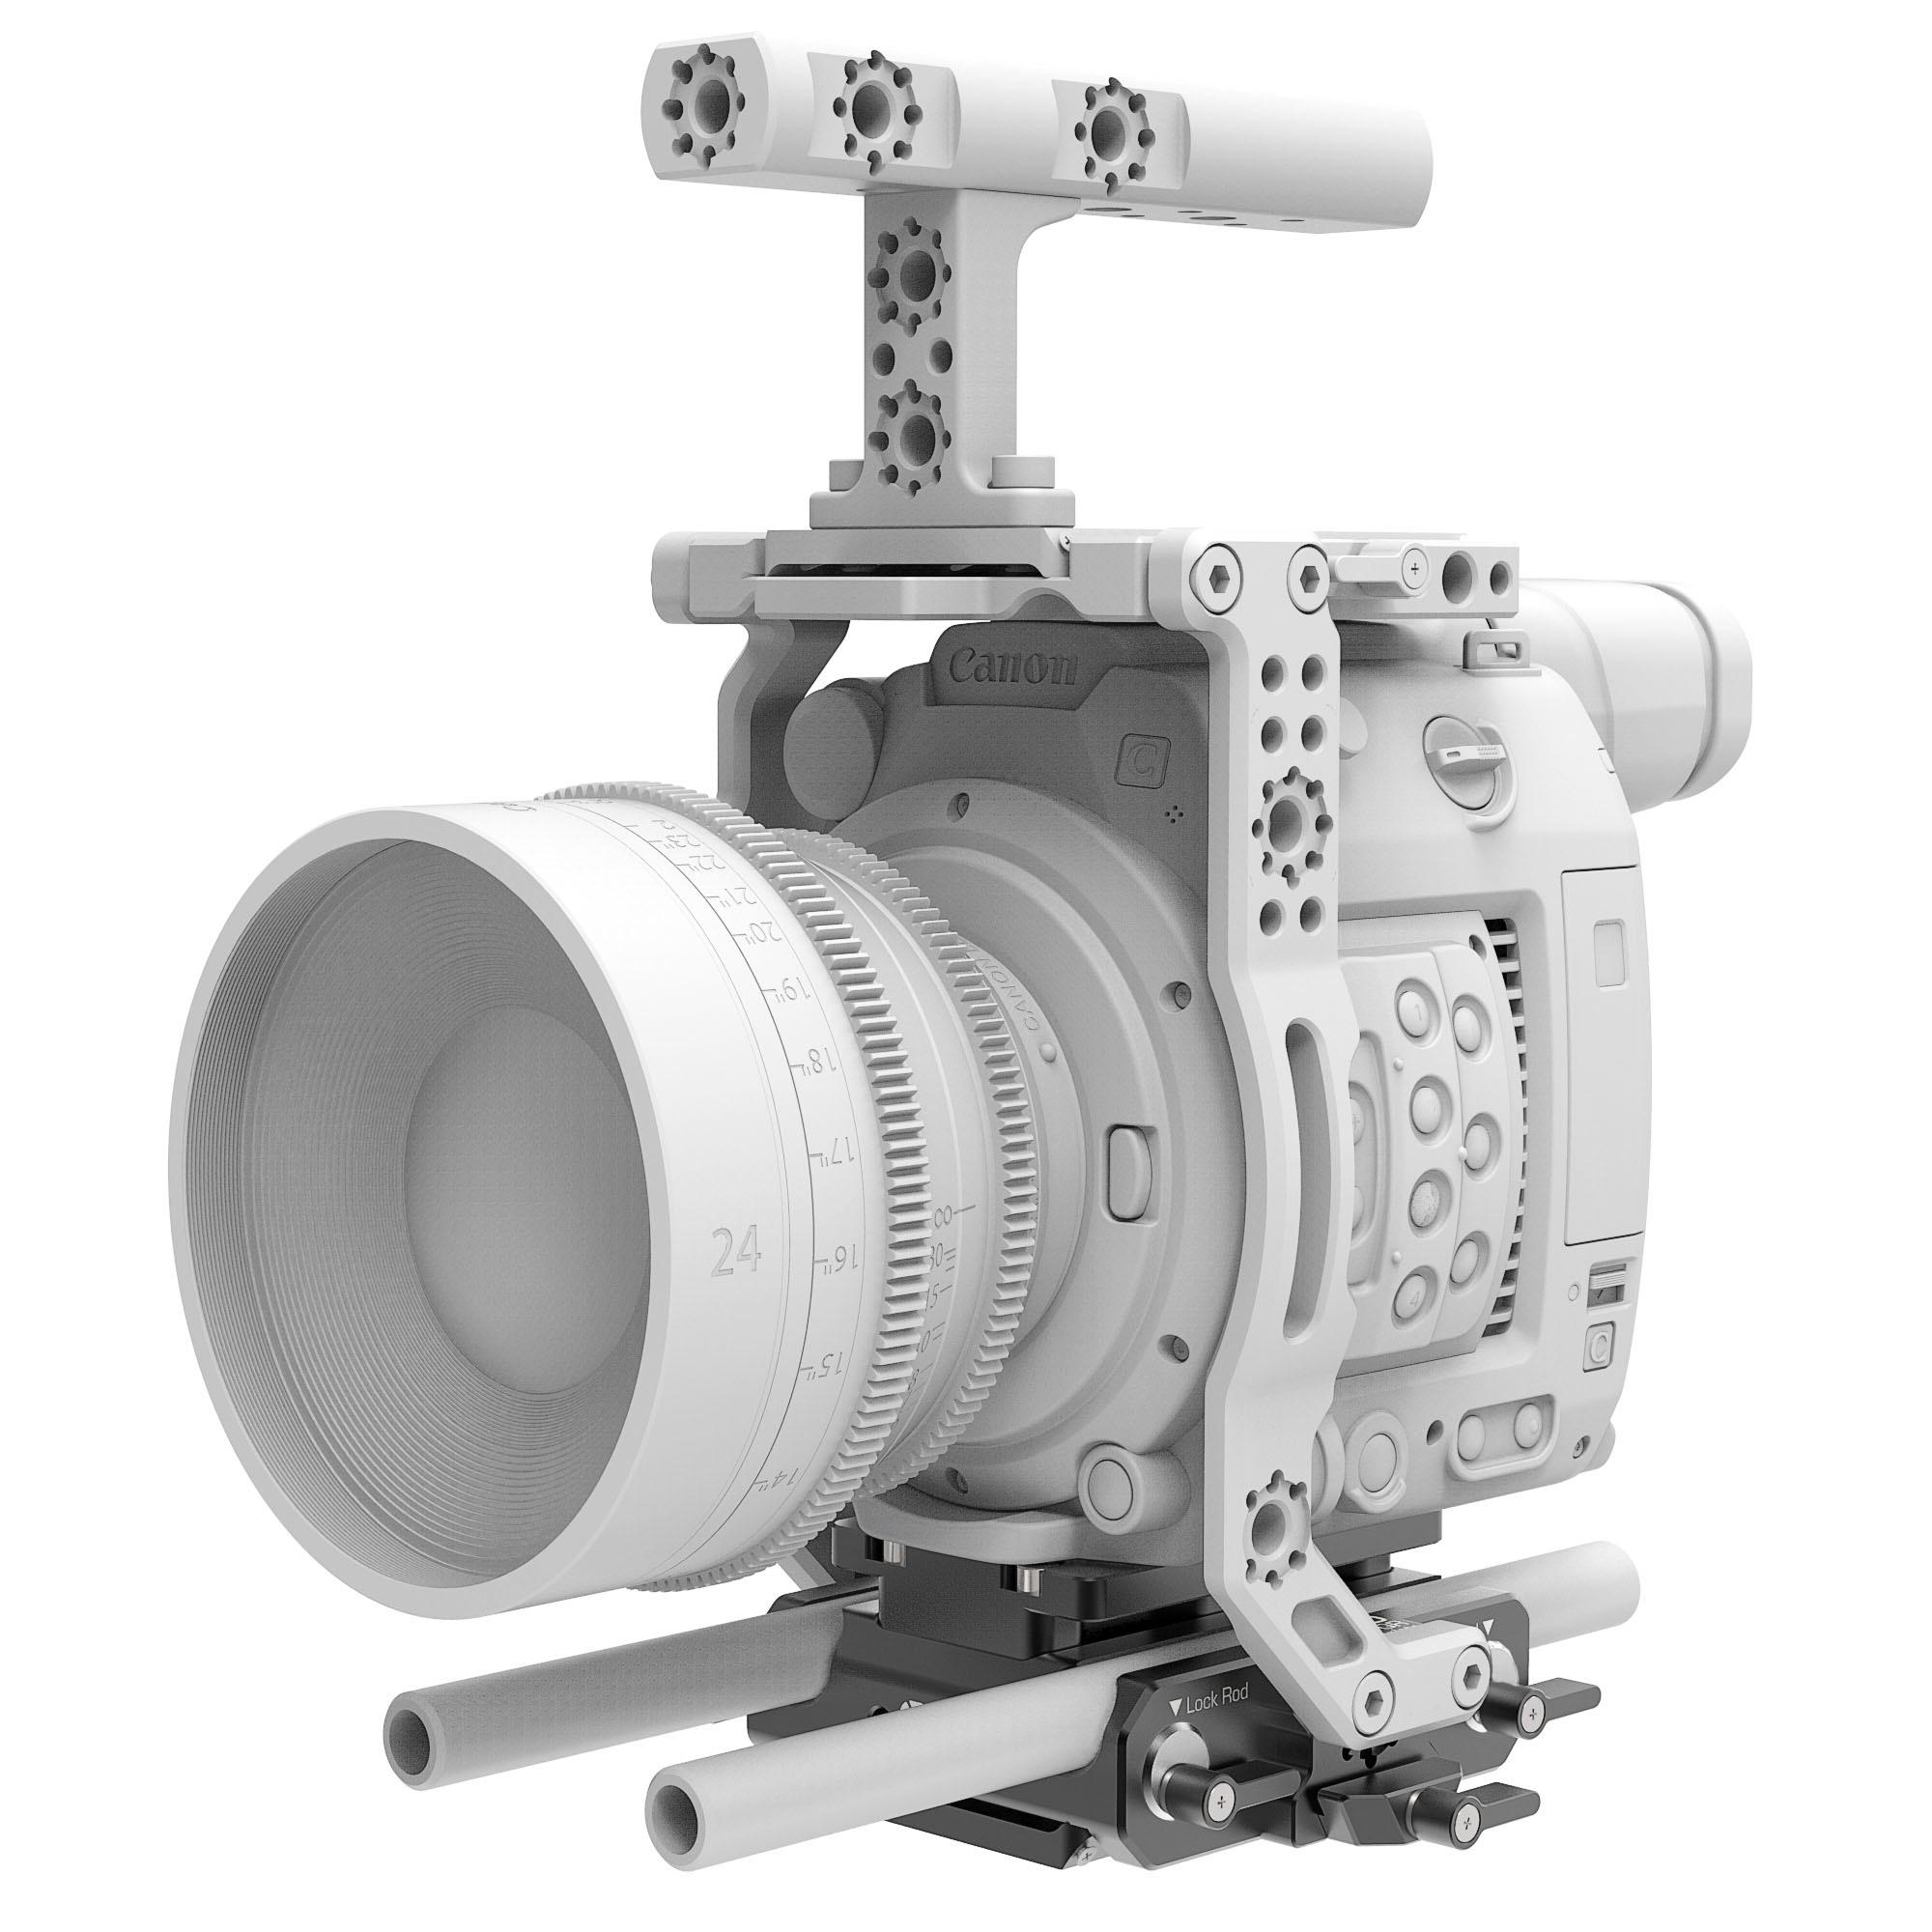 B4005.0001 Canon C200 LWS sliding Baseplate 14